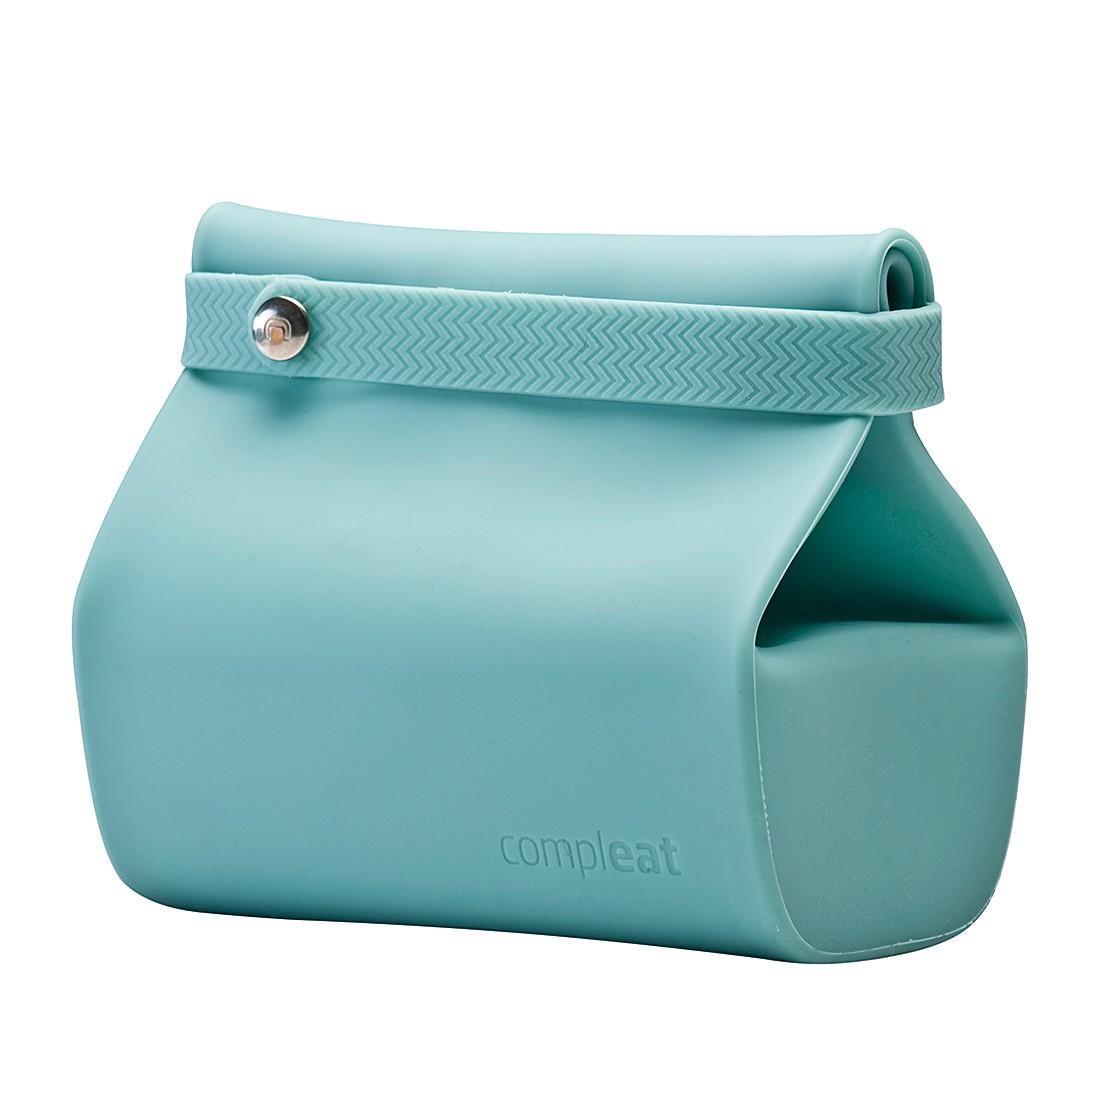 Lunchbox Foodbag – Silikon – Blau, Unikia jetzt bestellen